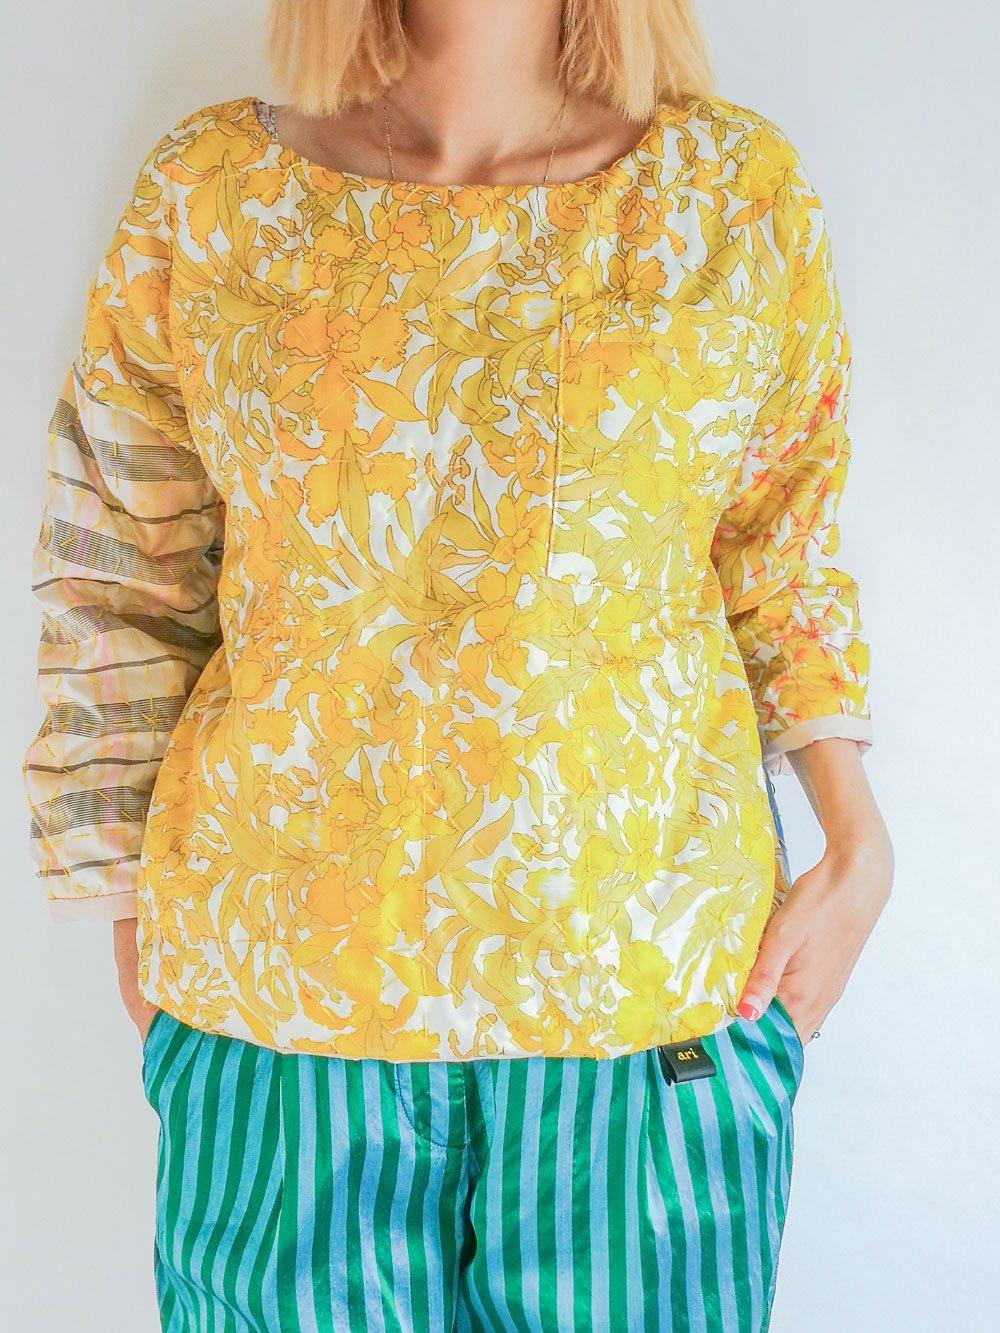 ari×mamarobot / Kilted Pullover S